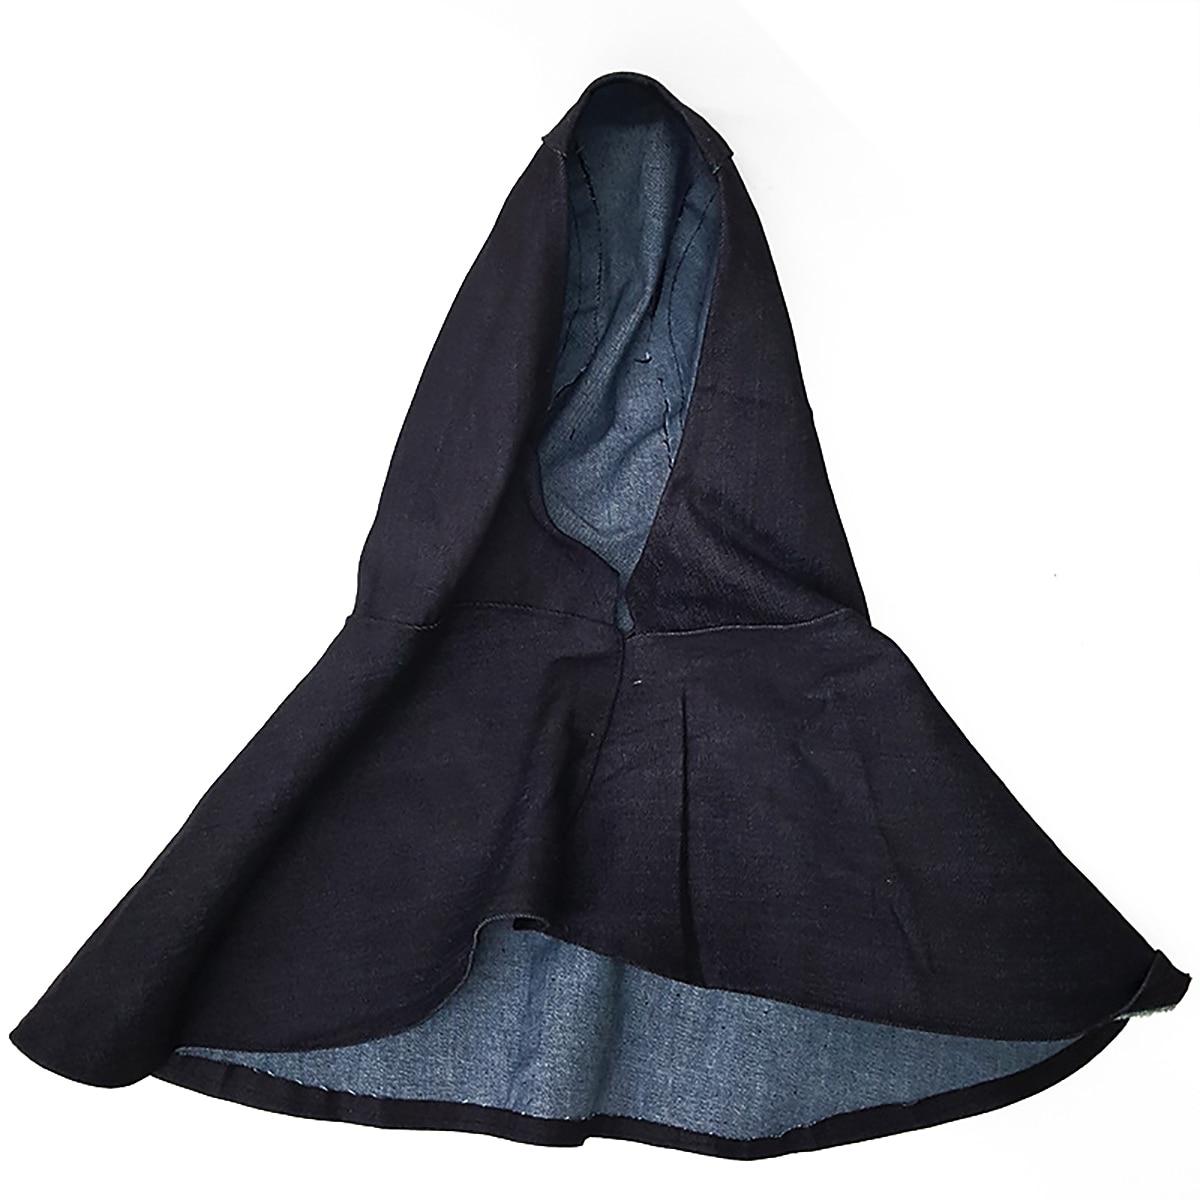 Denim Fabric Welding Head Neck Shoulder Protective Hood Cap Practical Flame Retardant Welder Safety Cover Helmet Mayitr